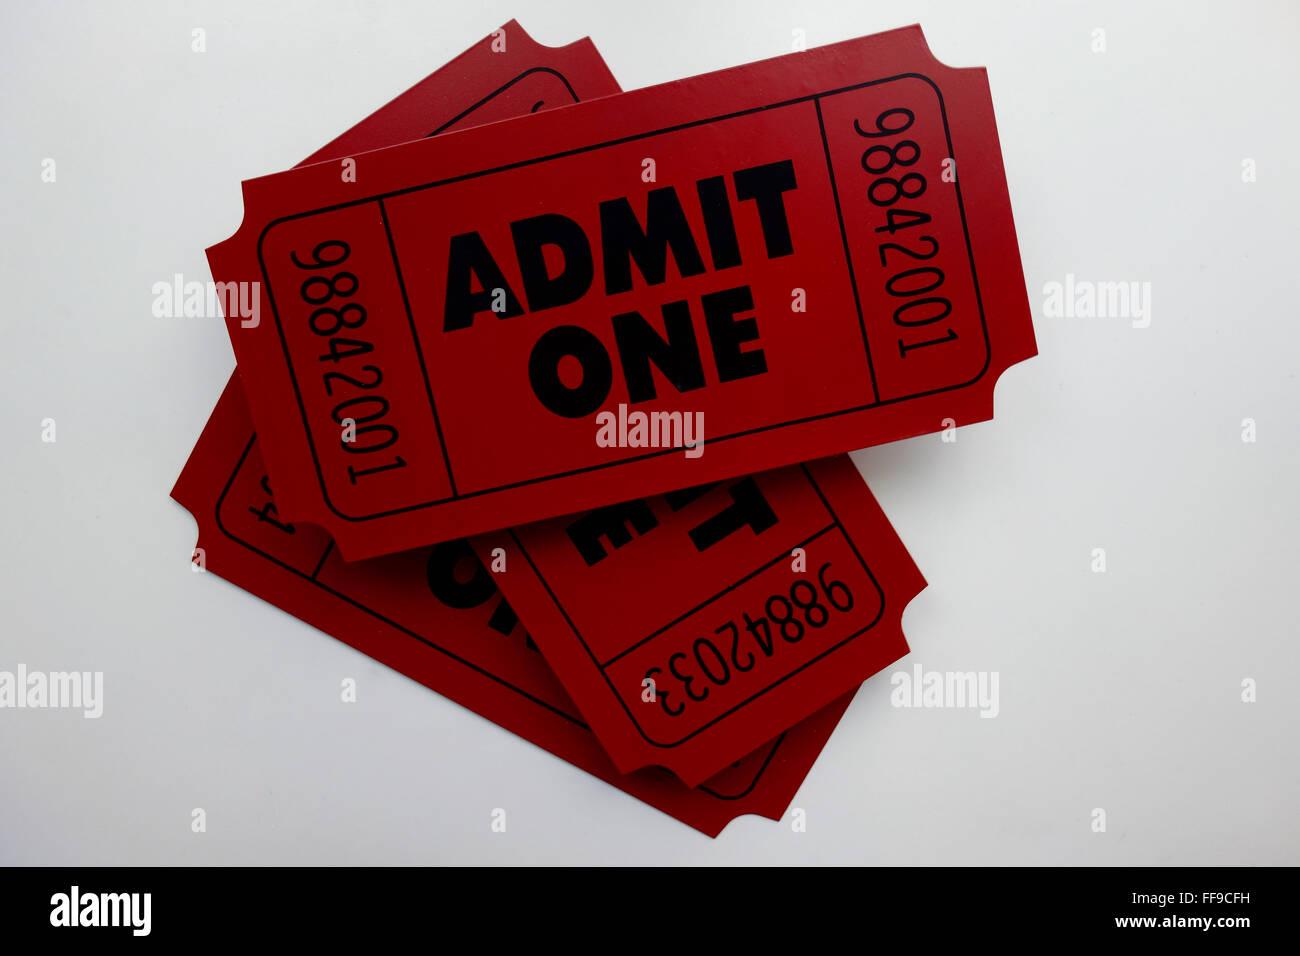 Admit One Ticket Stub - Stock Image